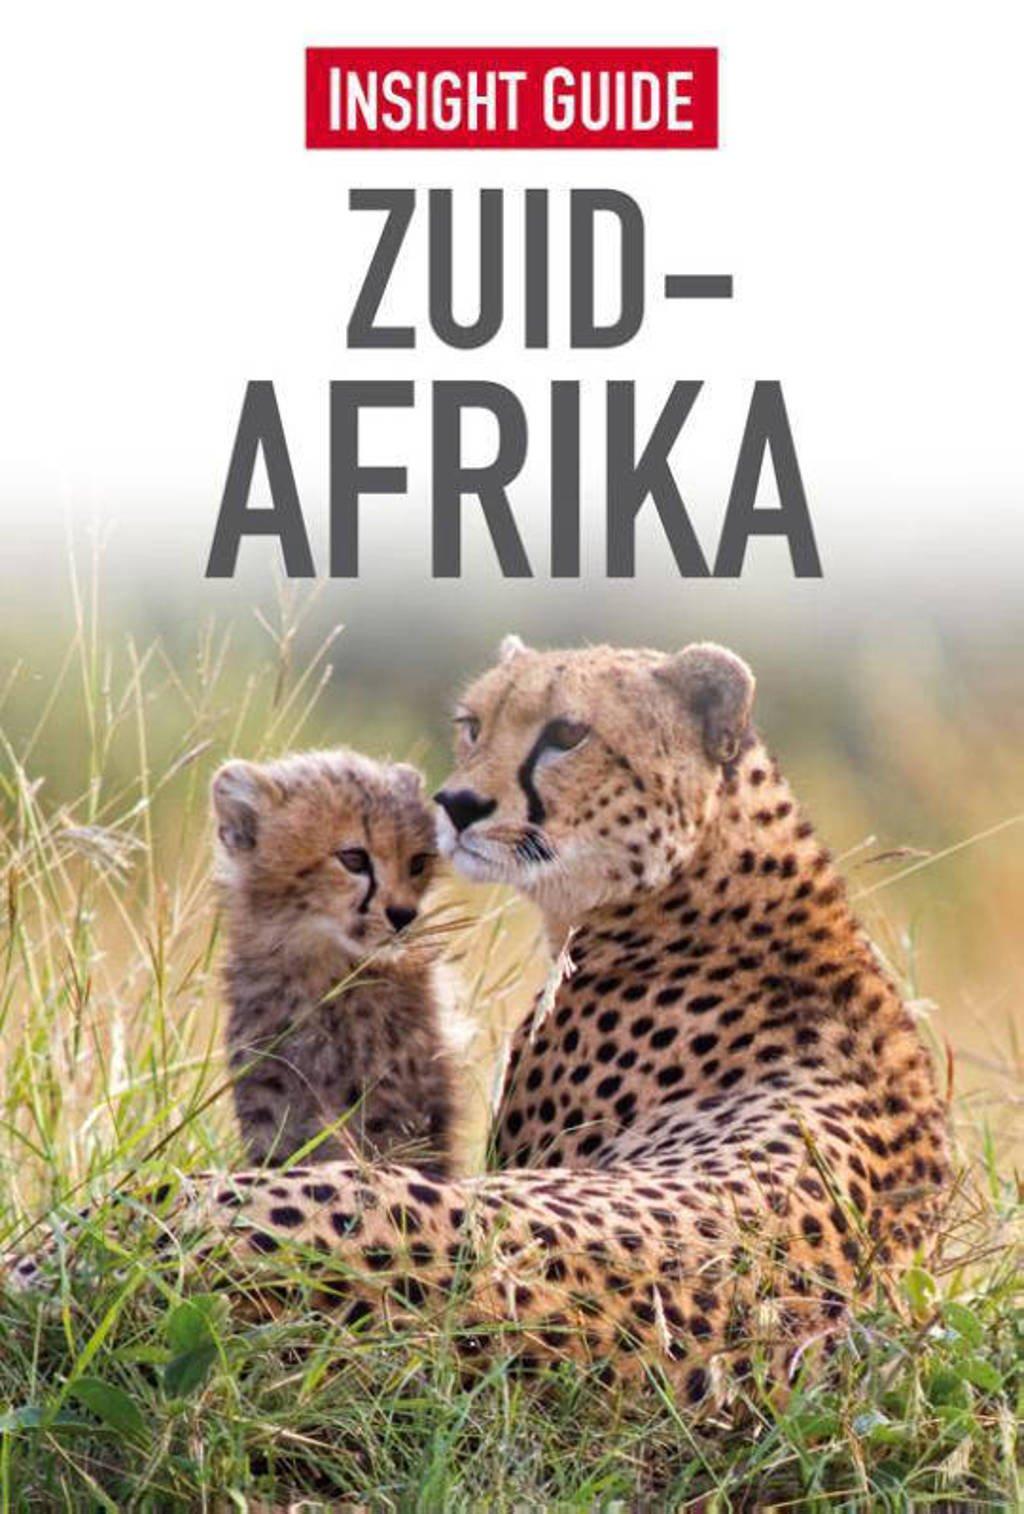 Insight guides: Zuid-Afrika